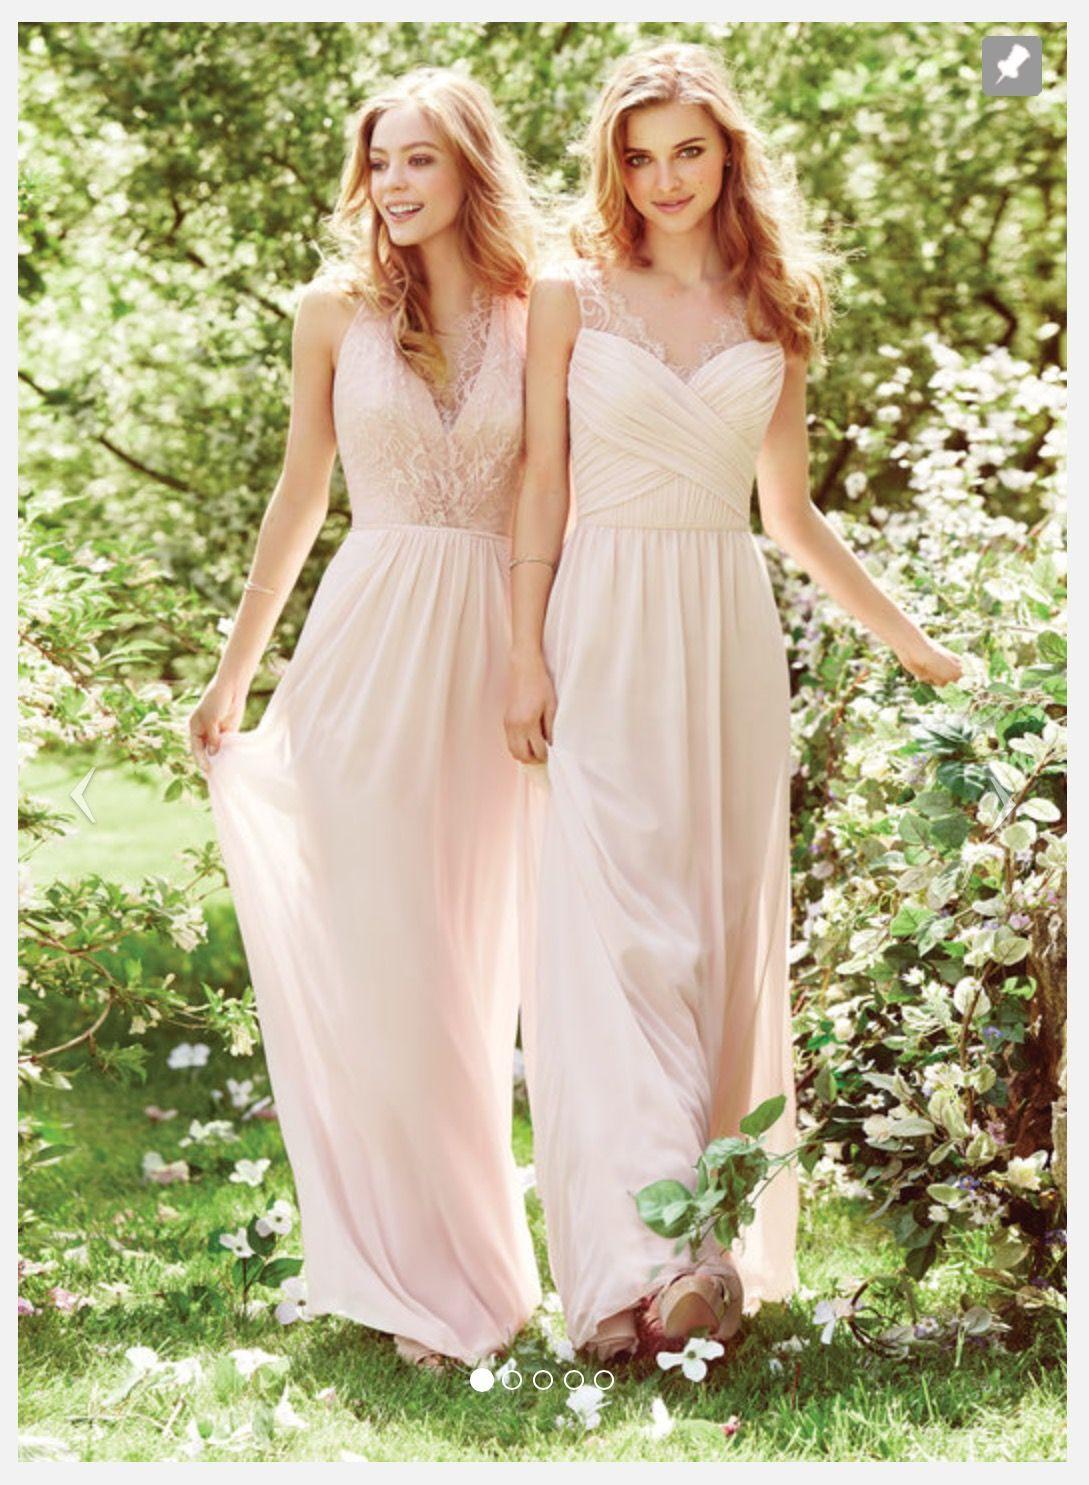 Hayley paige lace and chiffon blush bridesmaid dress hayley hayley paige lace and chiffon blush bridesmaid dress ombrellifo Gallery